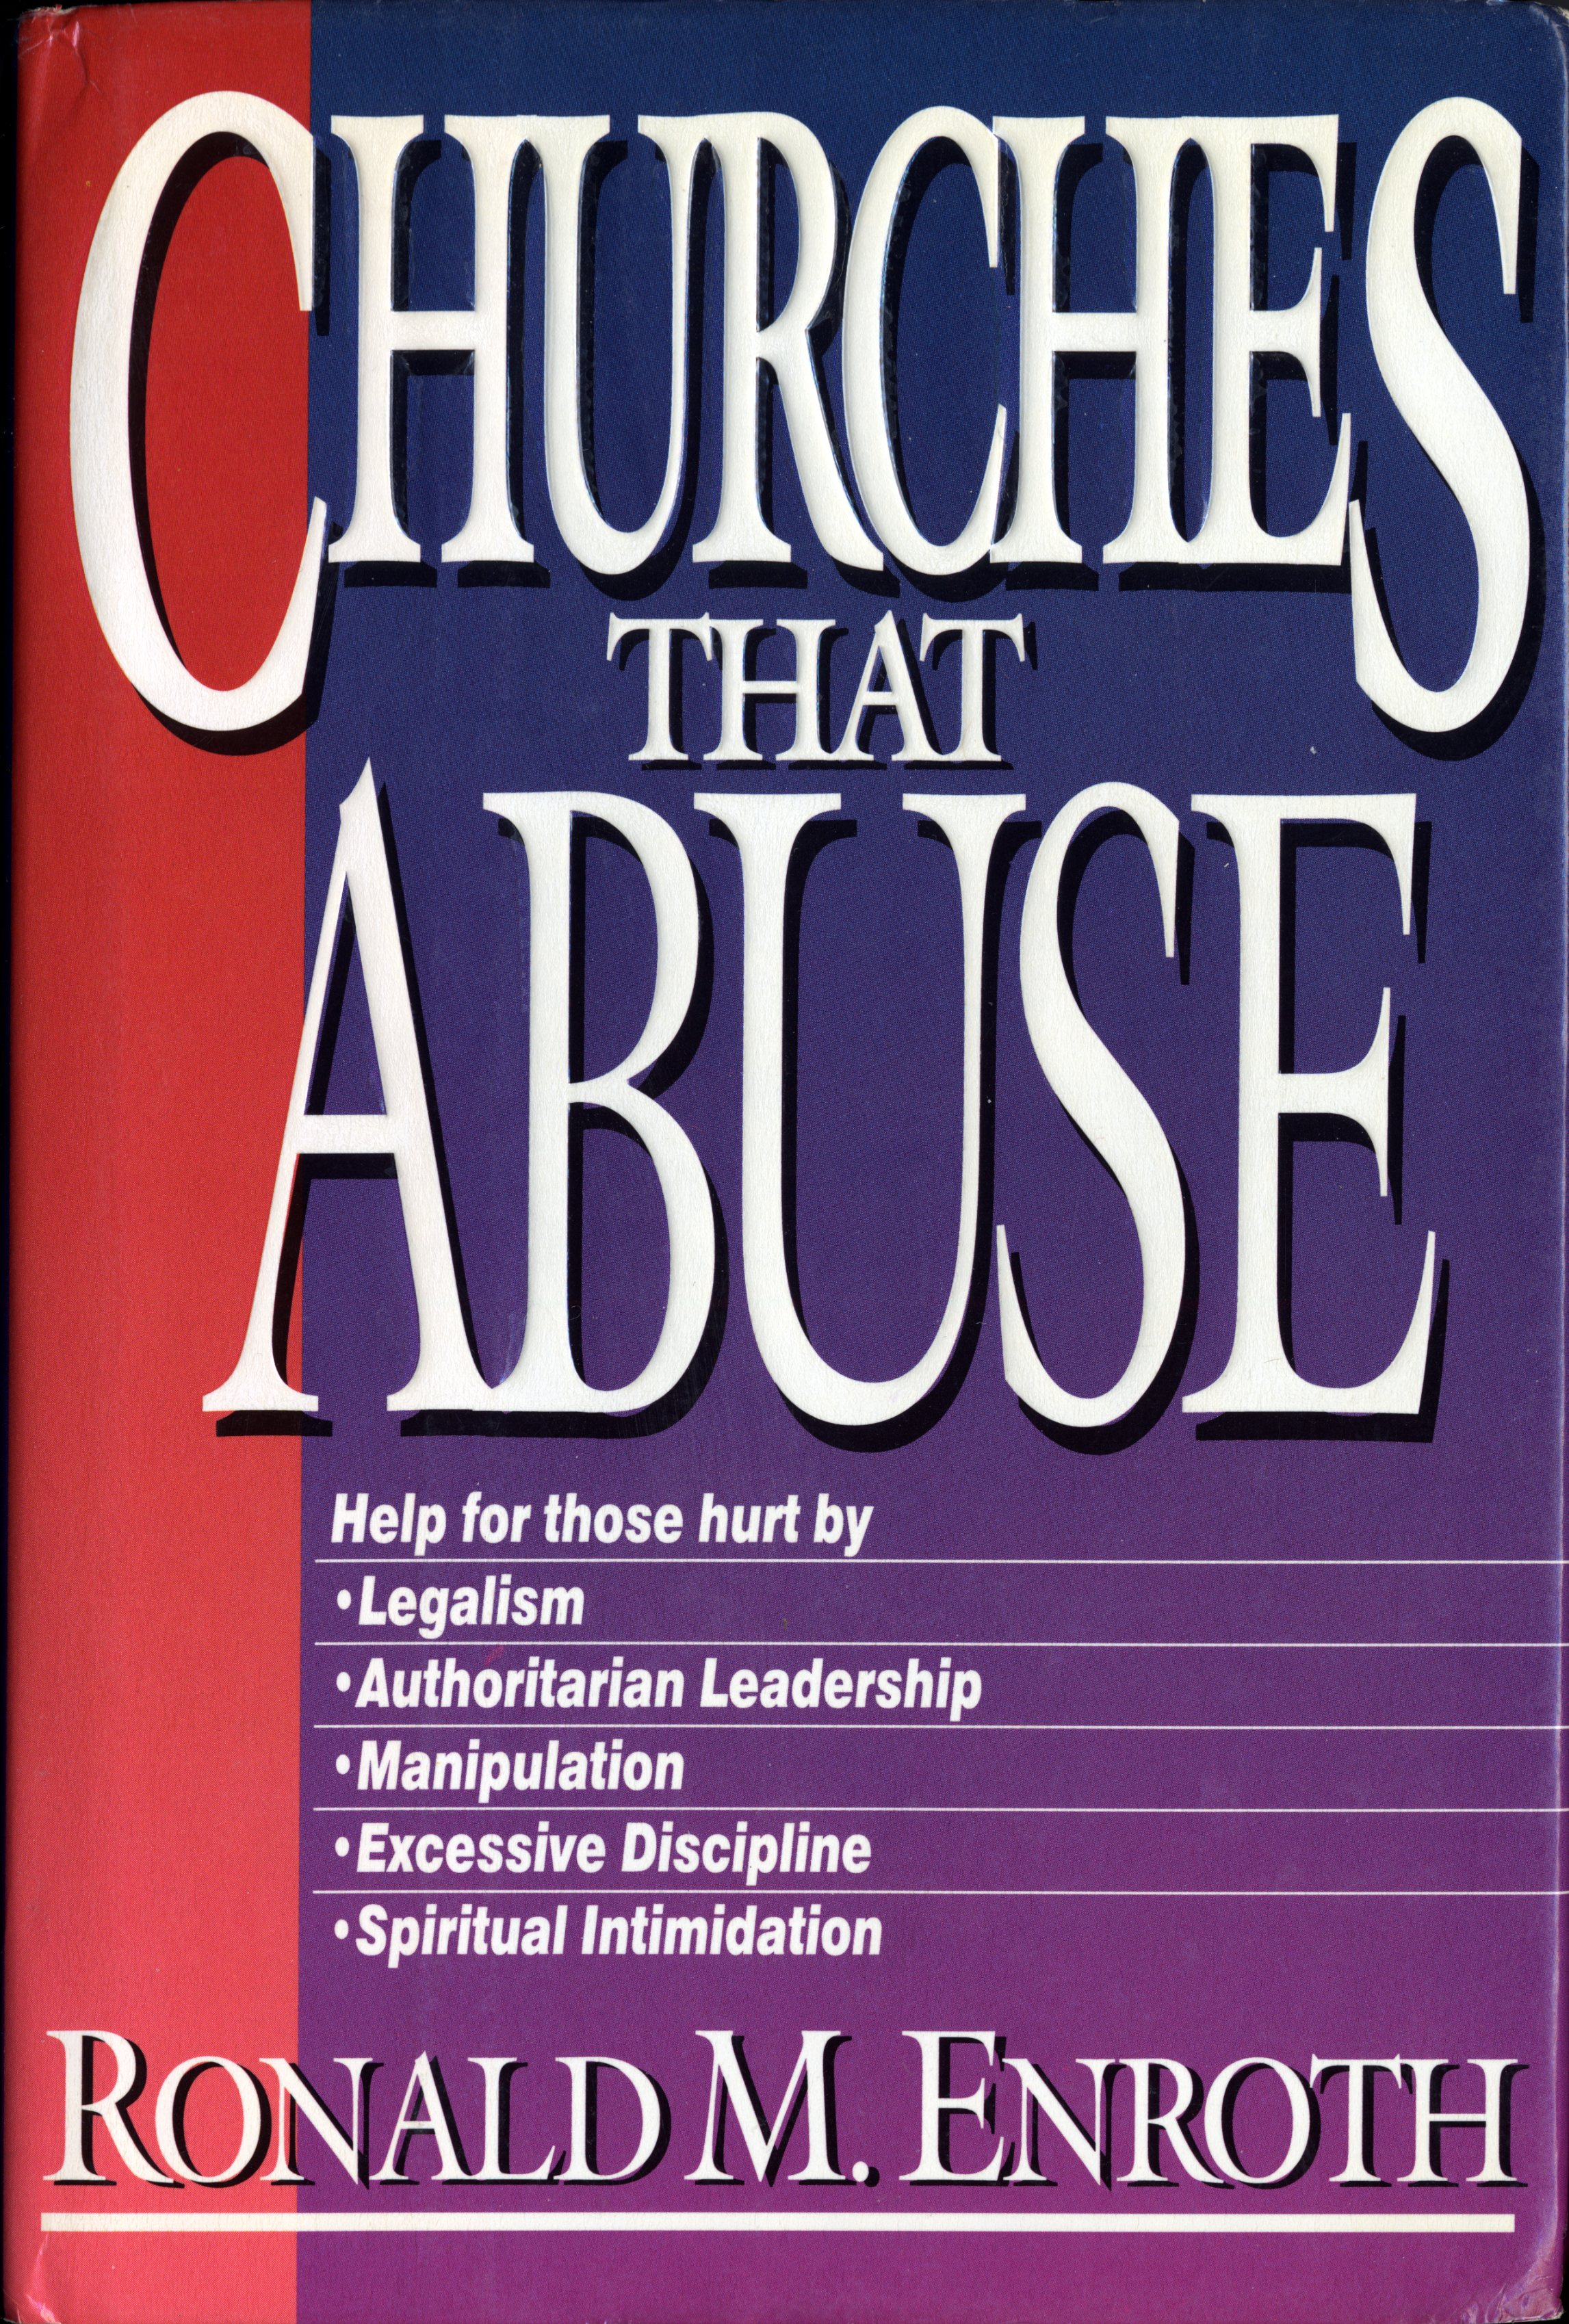 4 Spiritual Abuse Book Lists and Visual Bibliographies | futuristguy